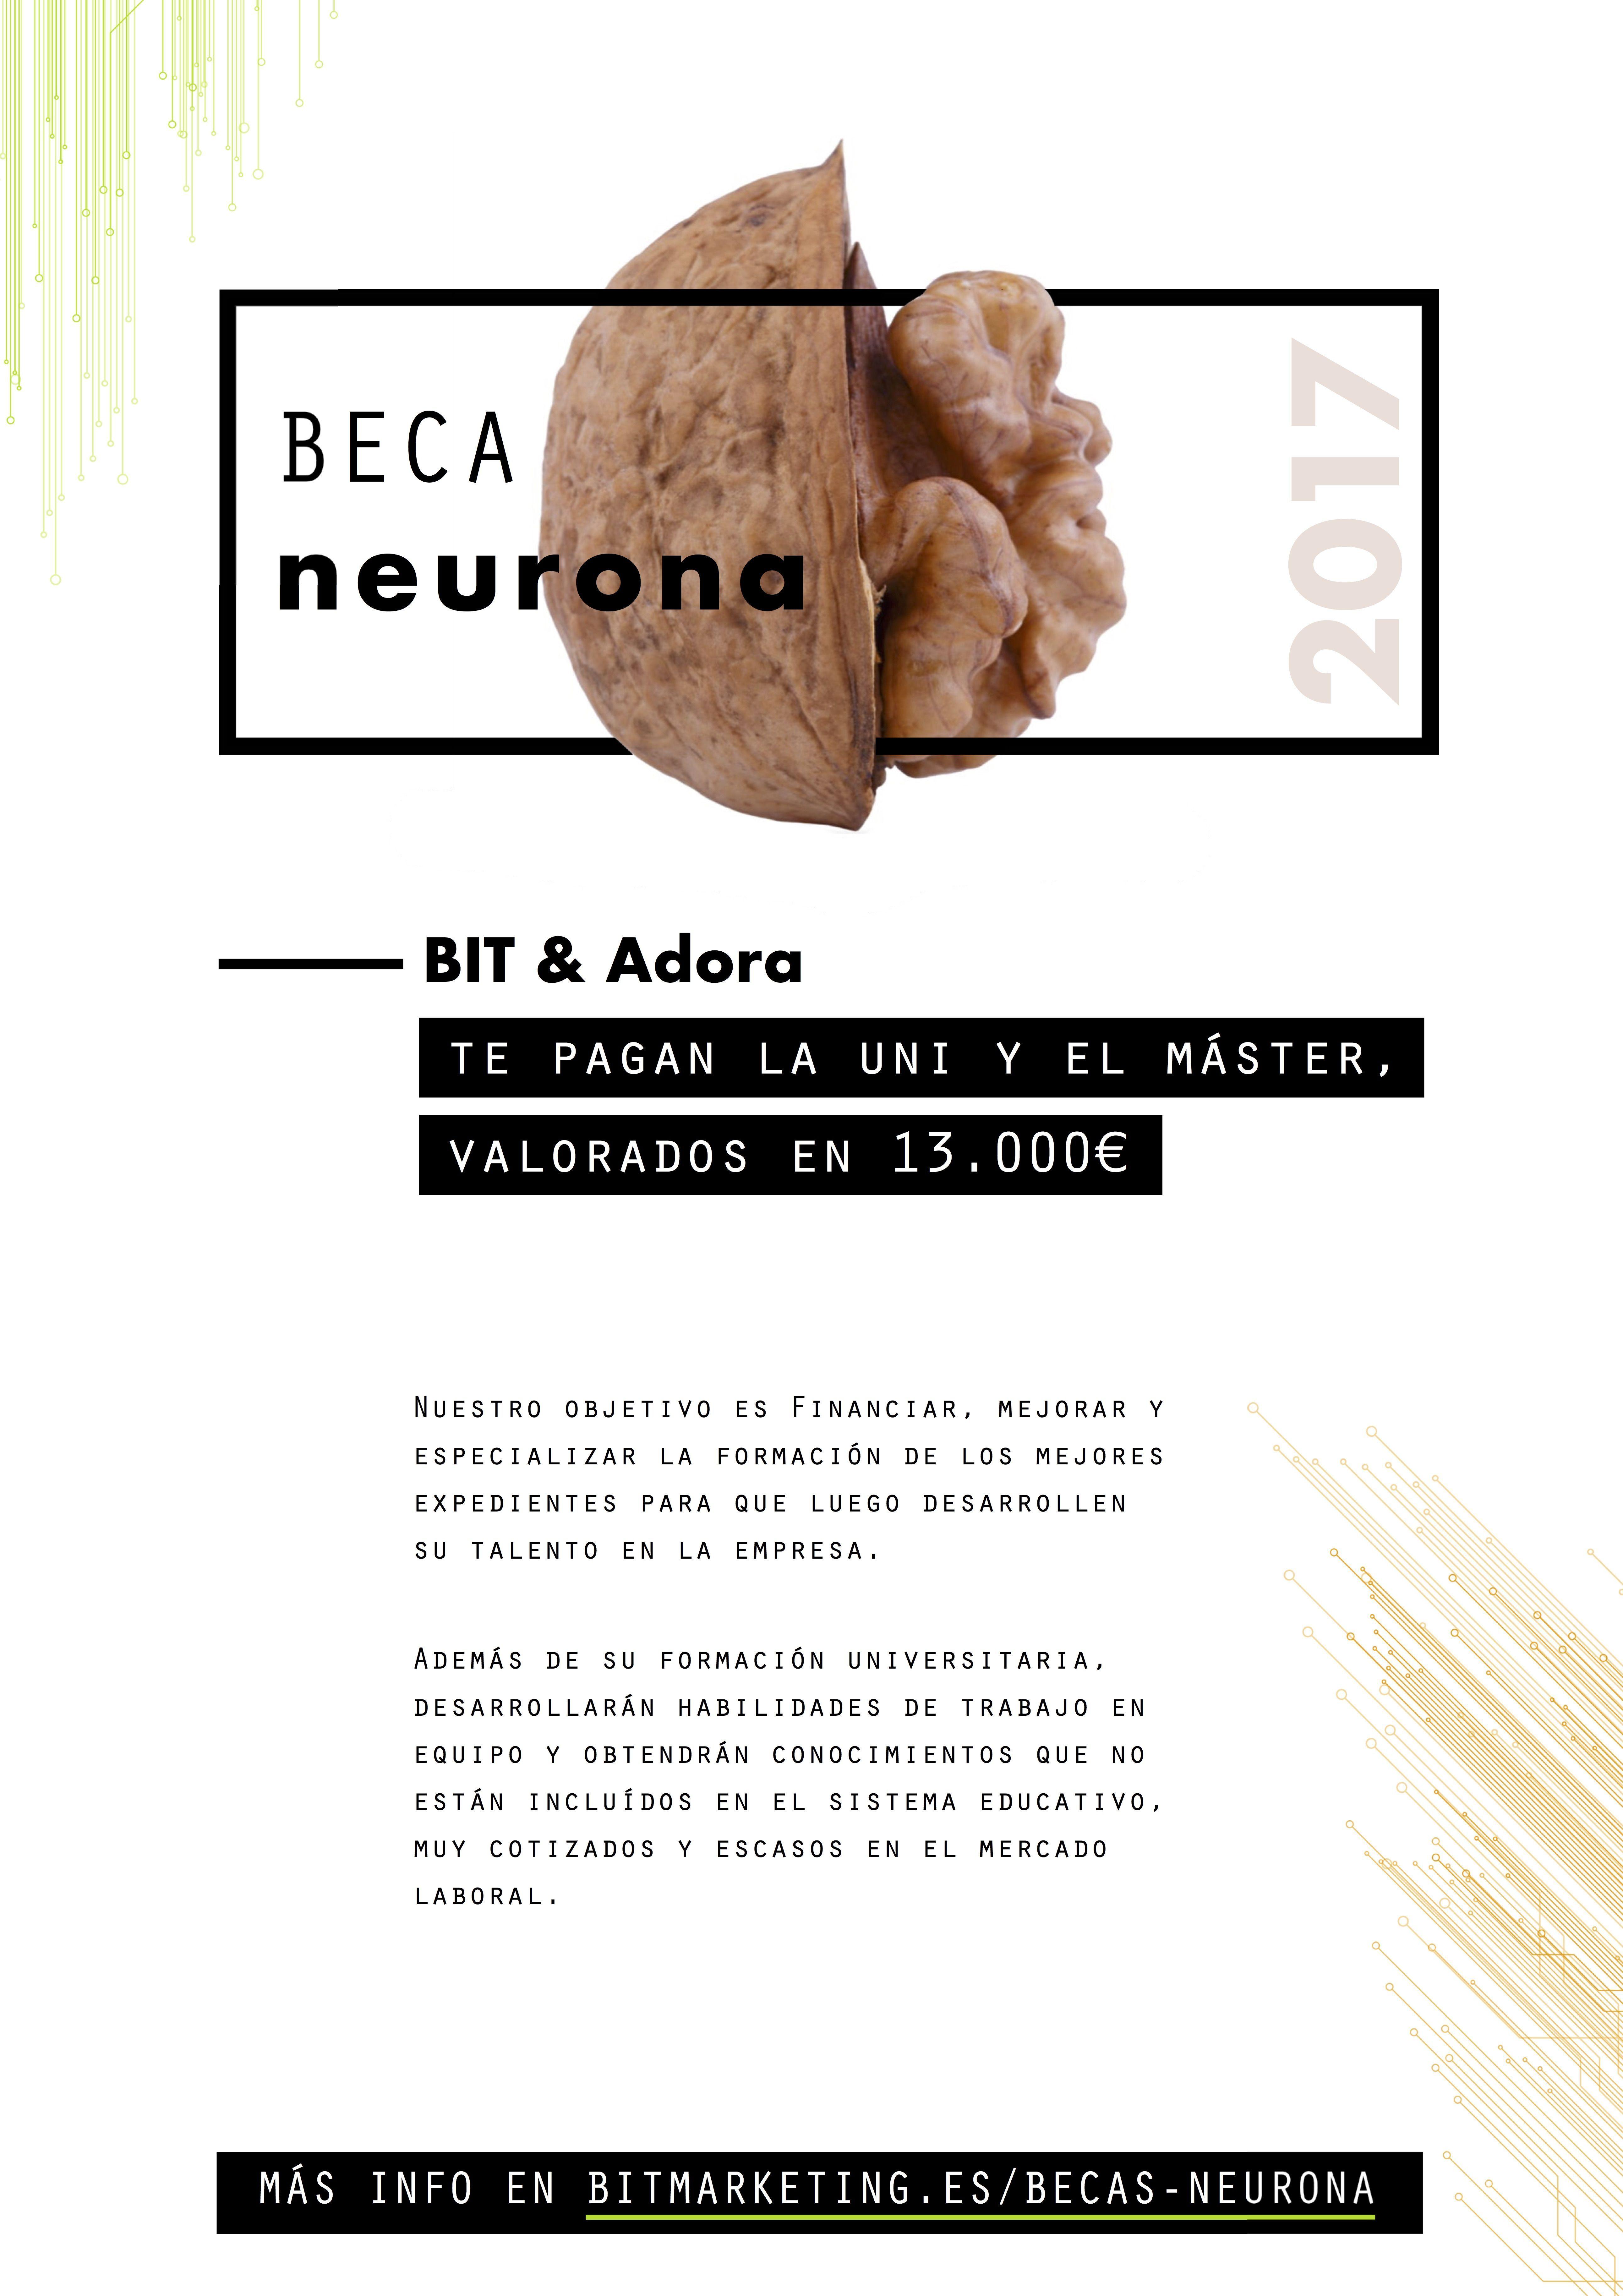 becas-neurona-bit-adora